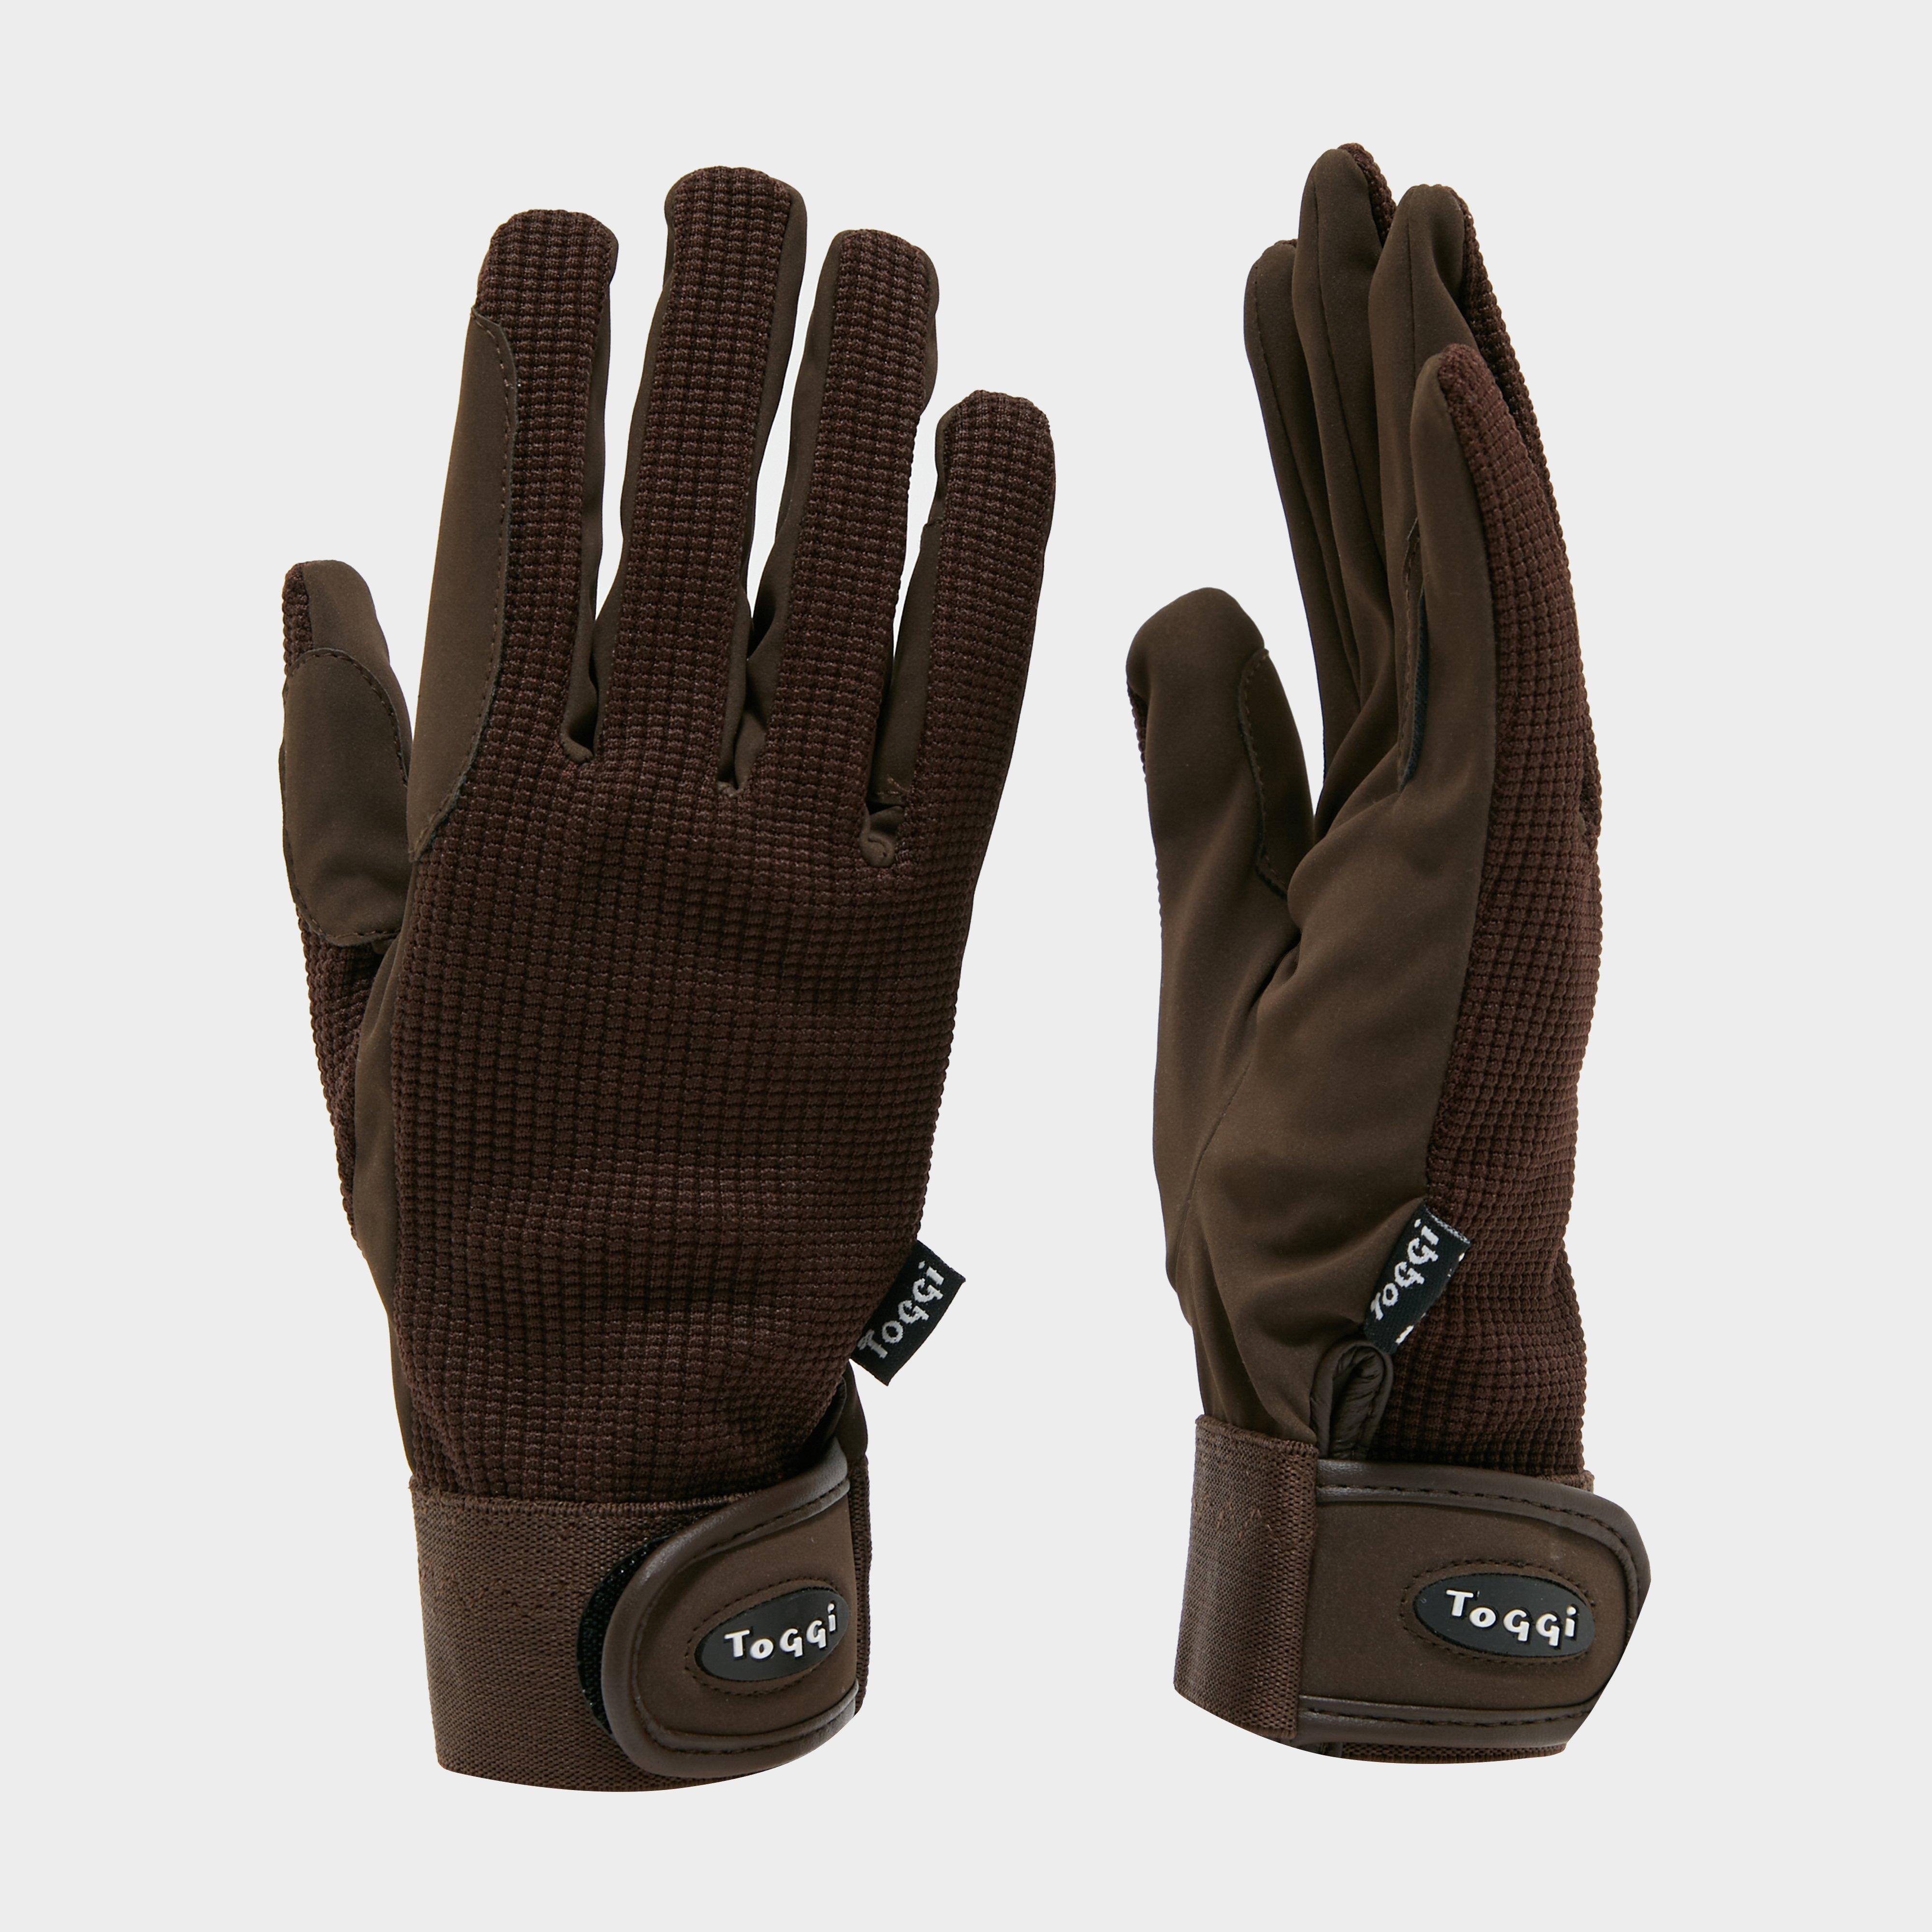 Image of Toggi Salisbury Everyday Riding Glove - Red/Glove, Red/GLOVE